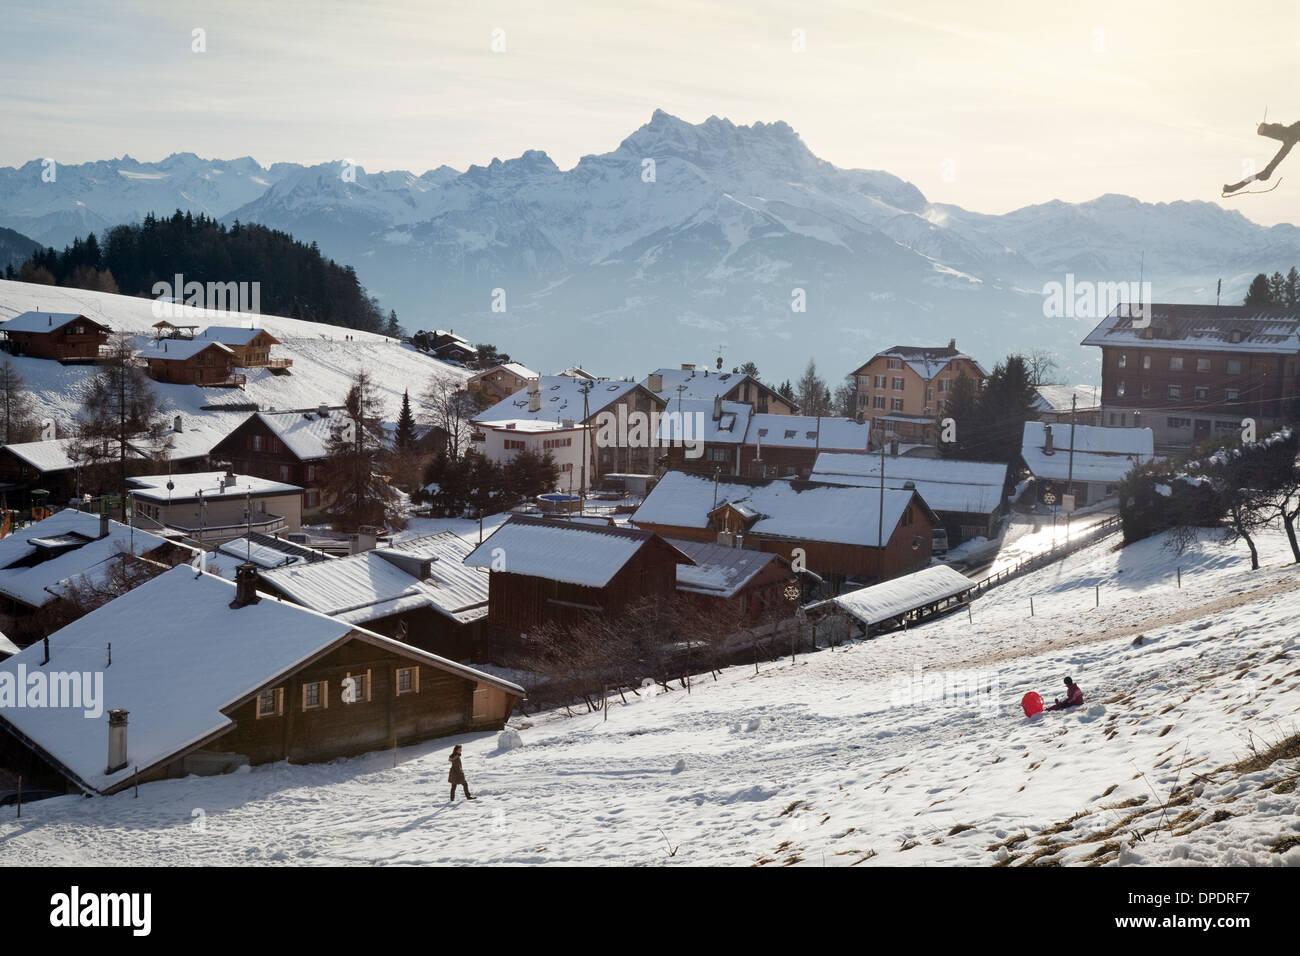 Alpine skiing village of Leysin at 1350m, Swiss Alps, Canton of  Vaud, Switzerland Europe - Stock Image